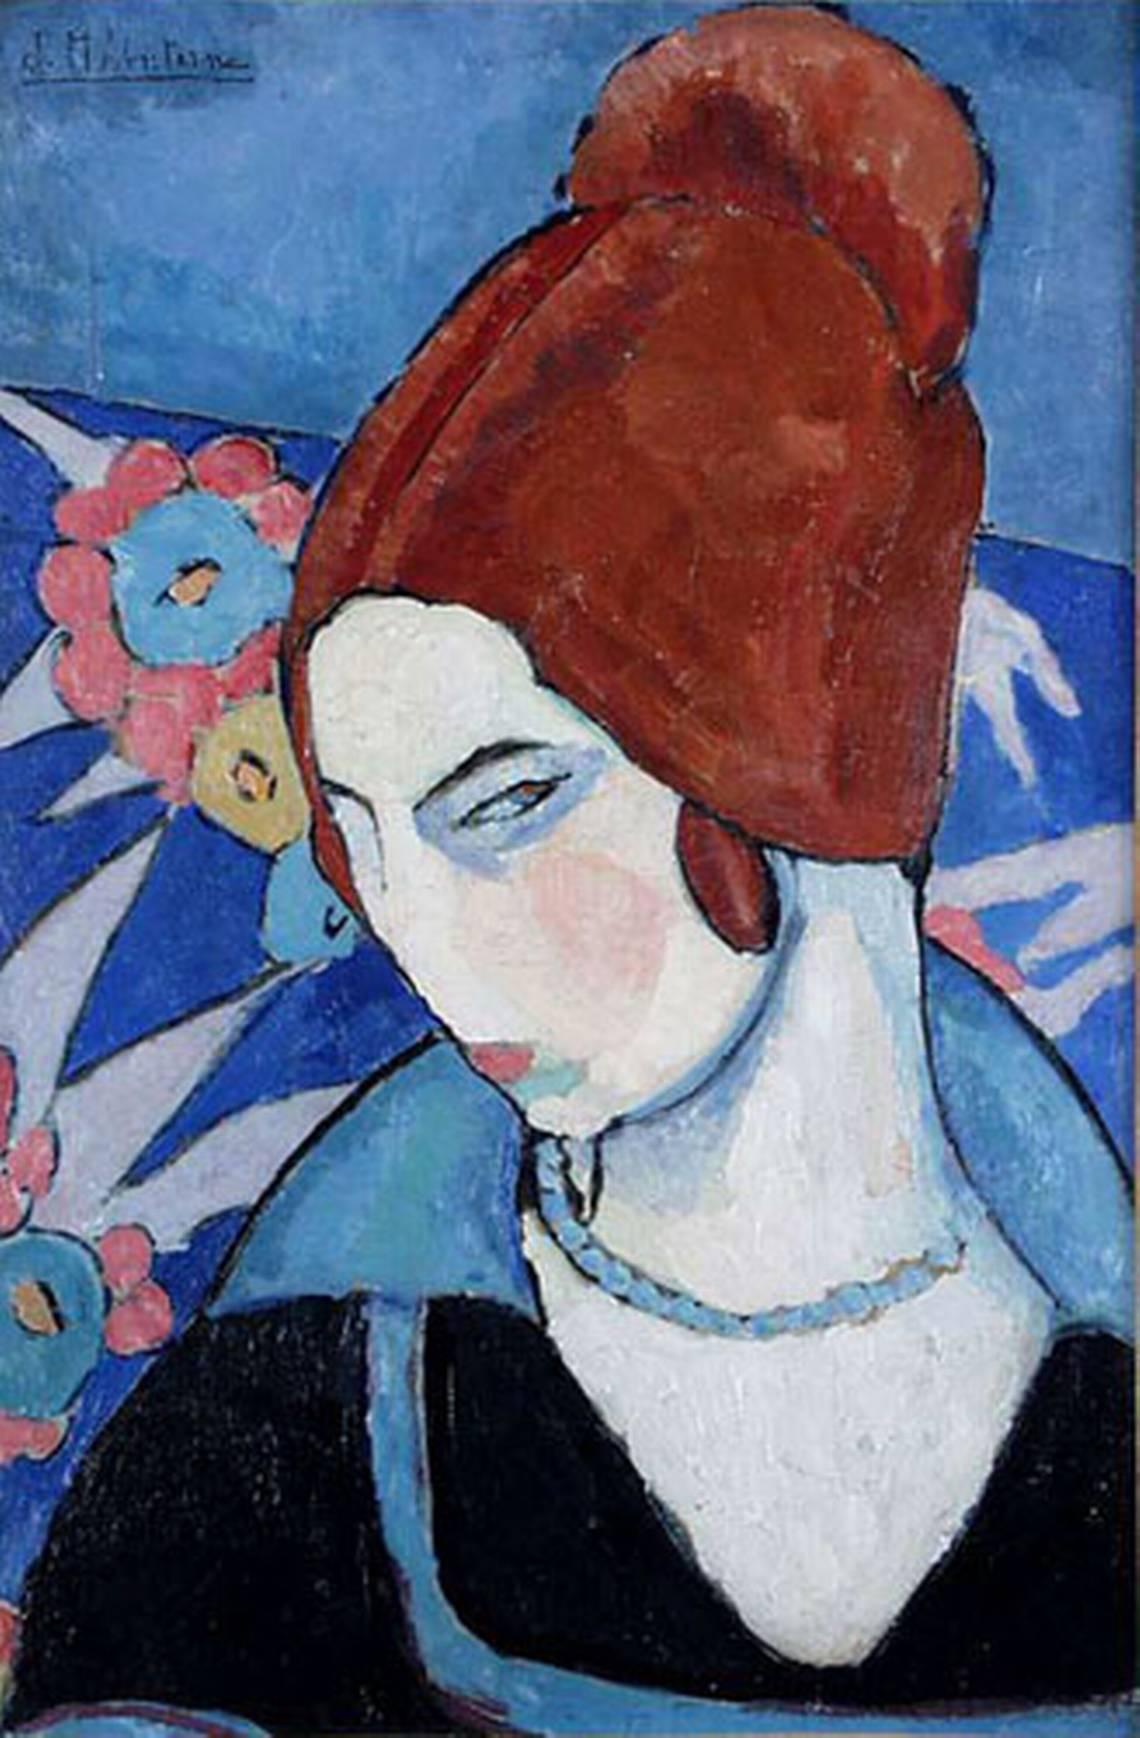 Jeanne Hébuterne, Autoritratto, 1916